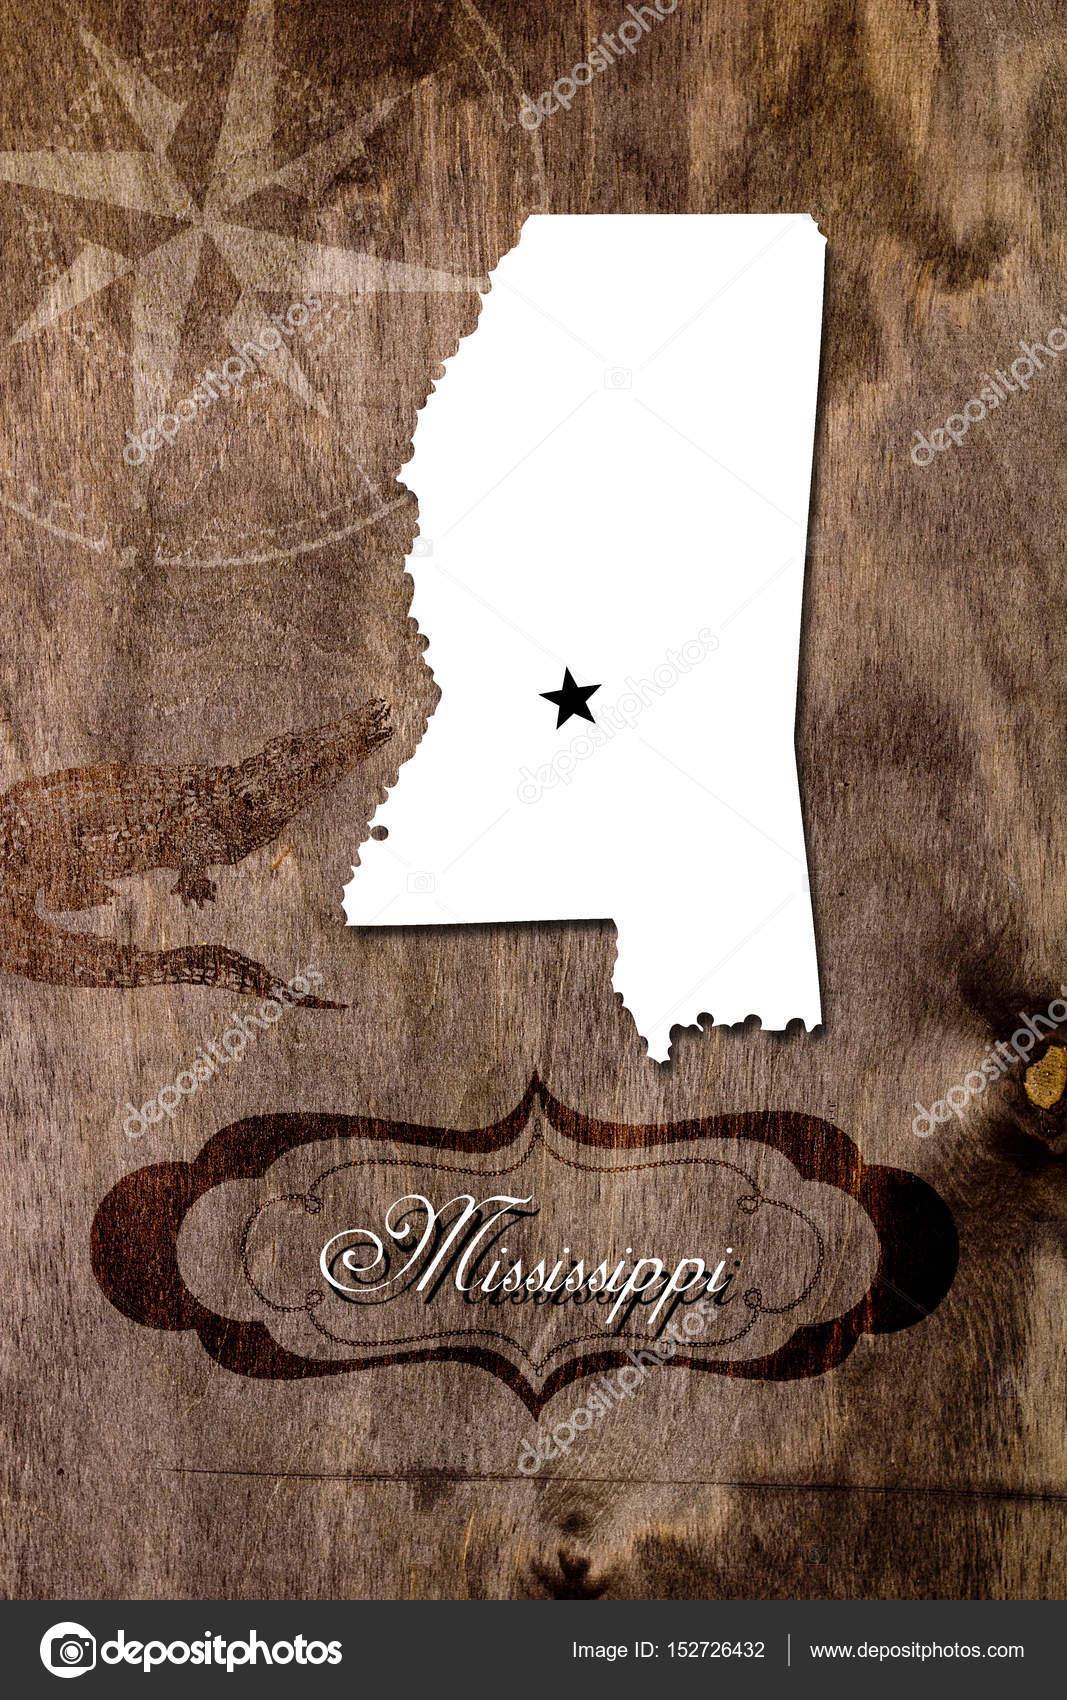 Mississippi State Map Outline.Poster Mississippi State Map Outline Stock Photo C Vipdesignusa